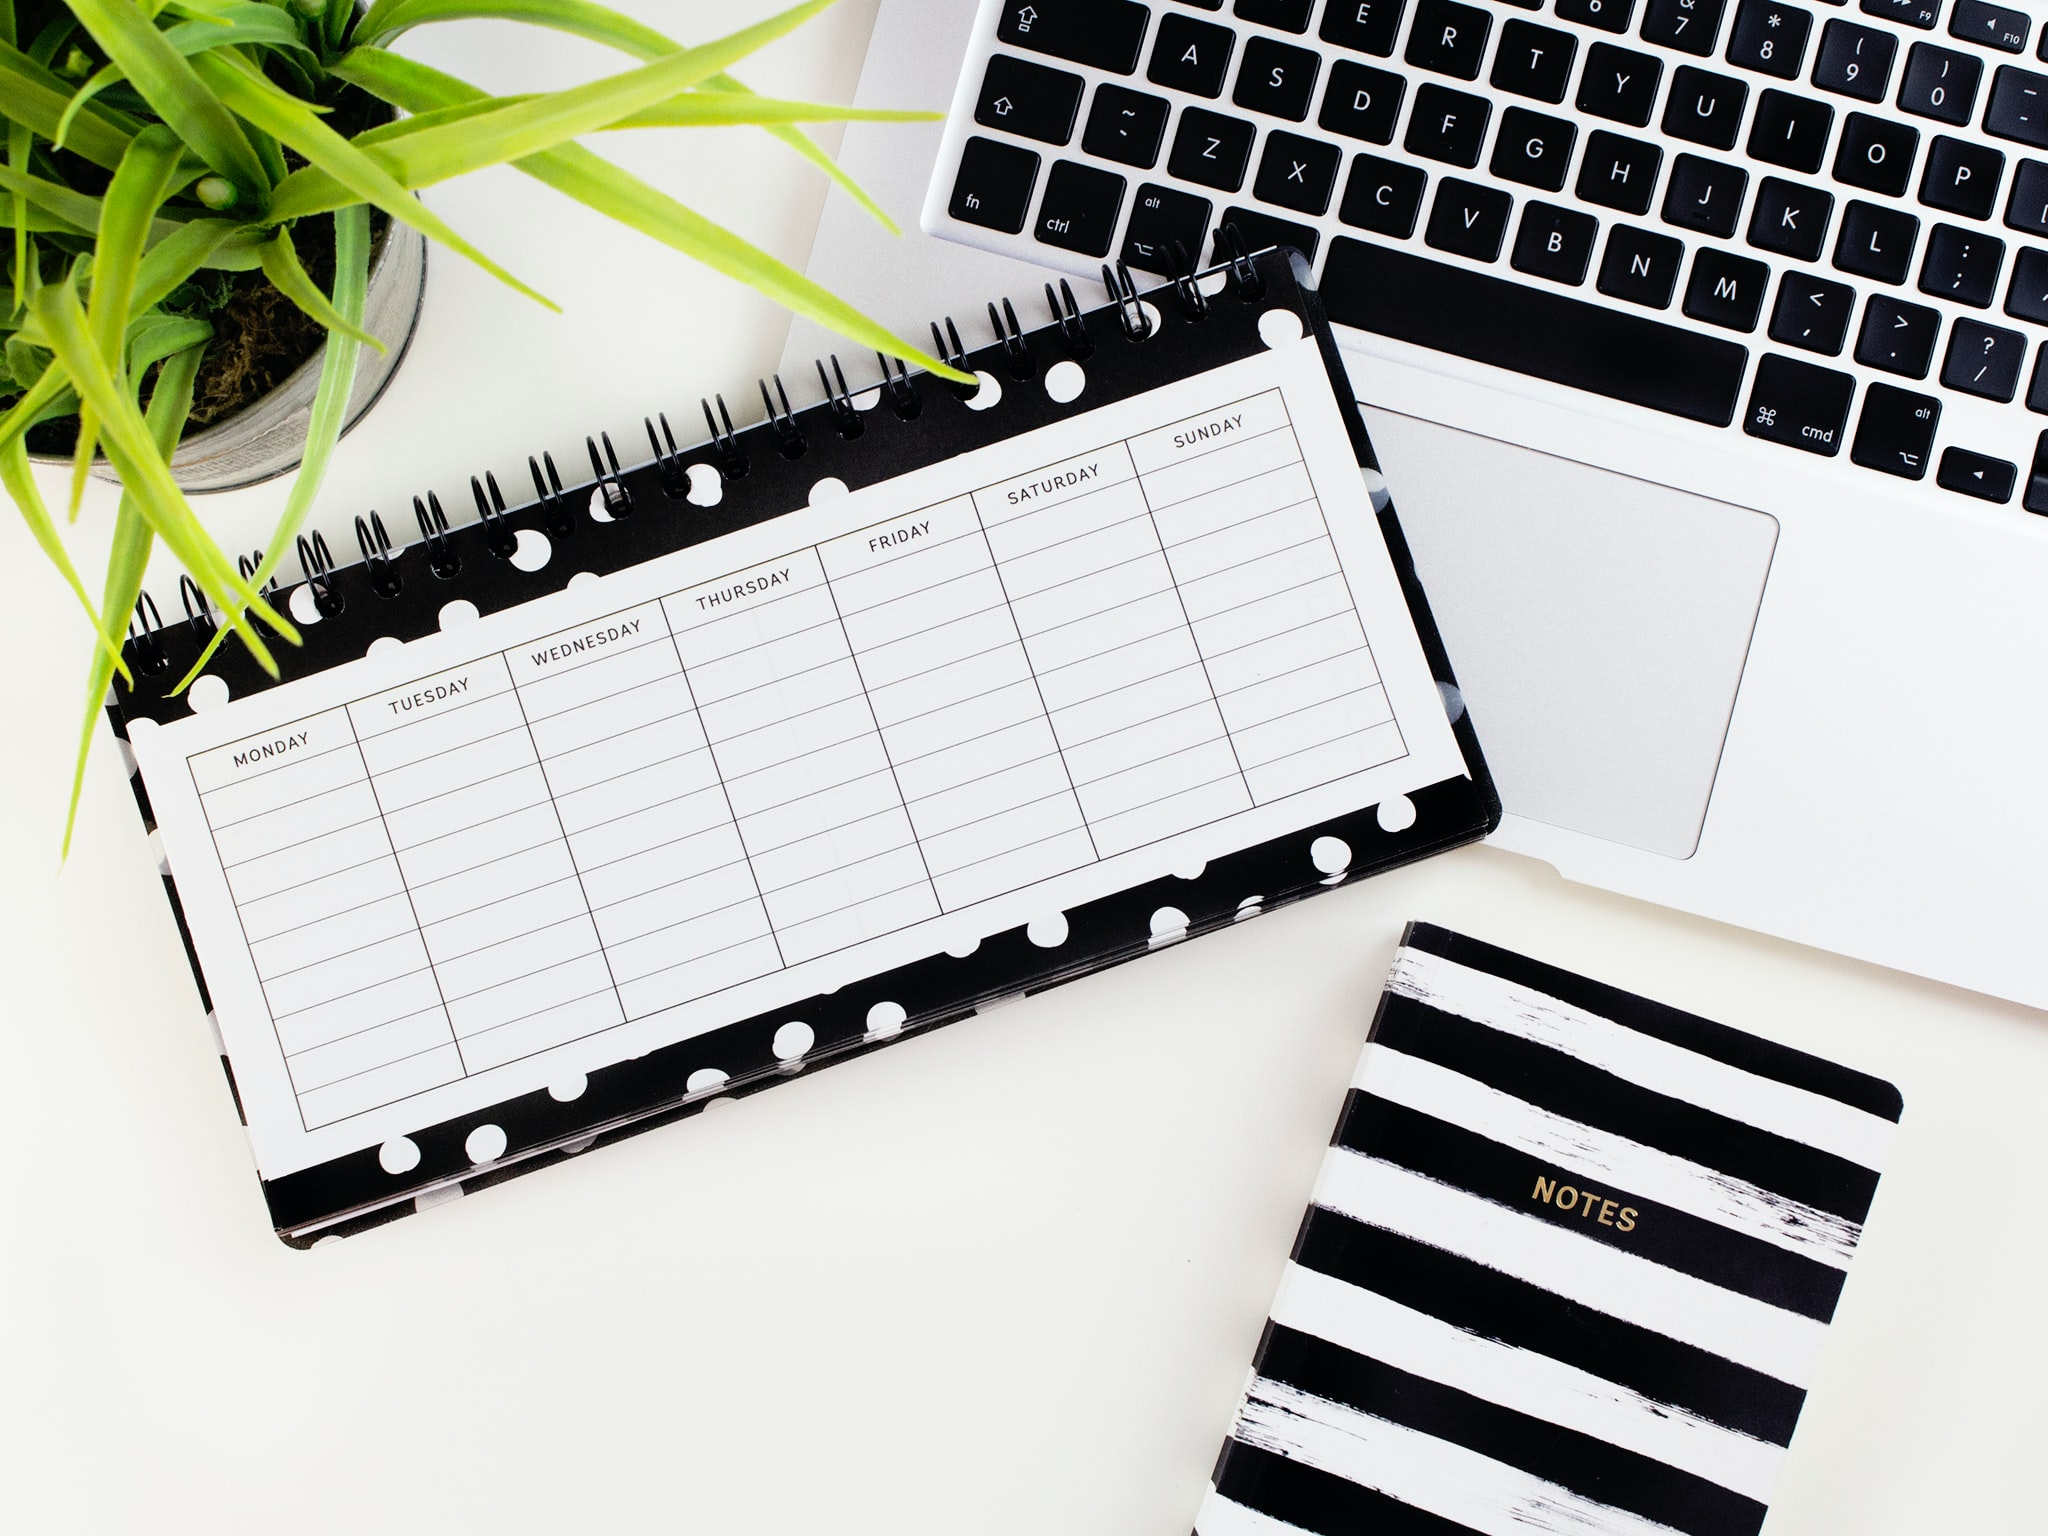 You are currently viewing [Podcast] : La procrastination, pourquoi je procrastine ?